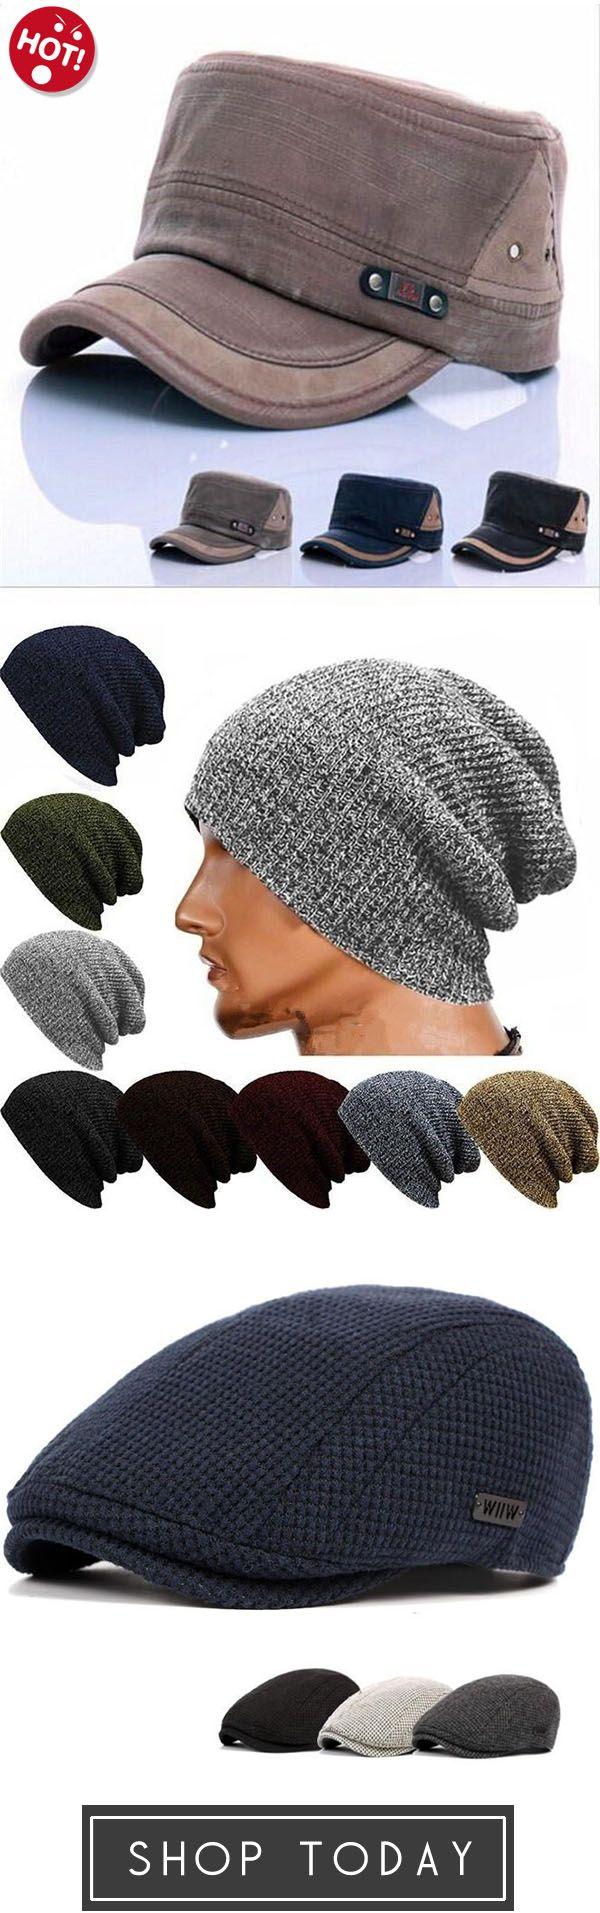 9fc5a5303dab80 Winter Casual Cotton Knit Cap Baggy Beanie Crochet Cap Outdoor Ski Cap,Vintage  Army Plain Flat Cadet Hat,Mens Cotton Gatsby Beret Cap Golf Flat Cabbie Hat